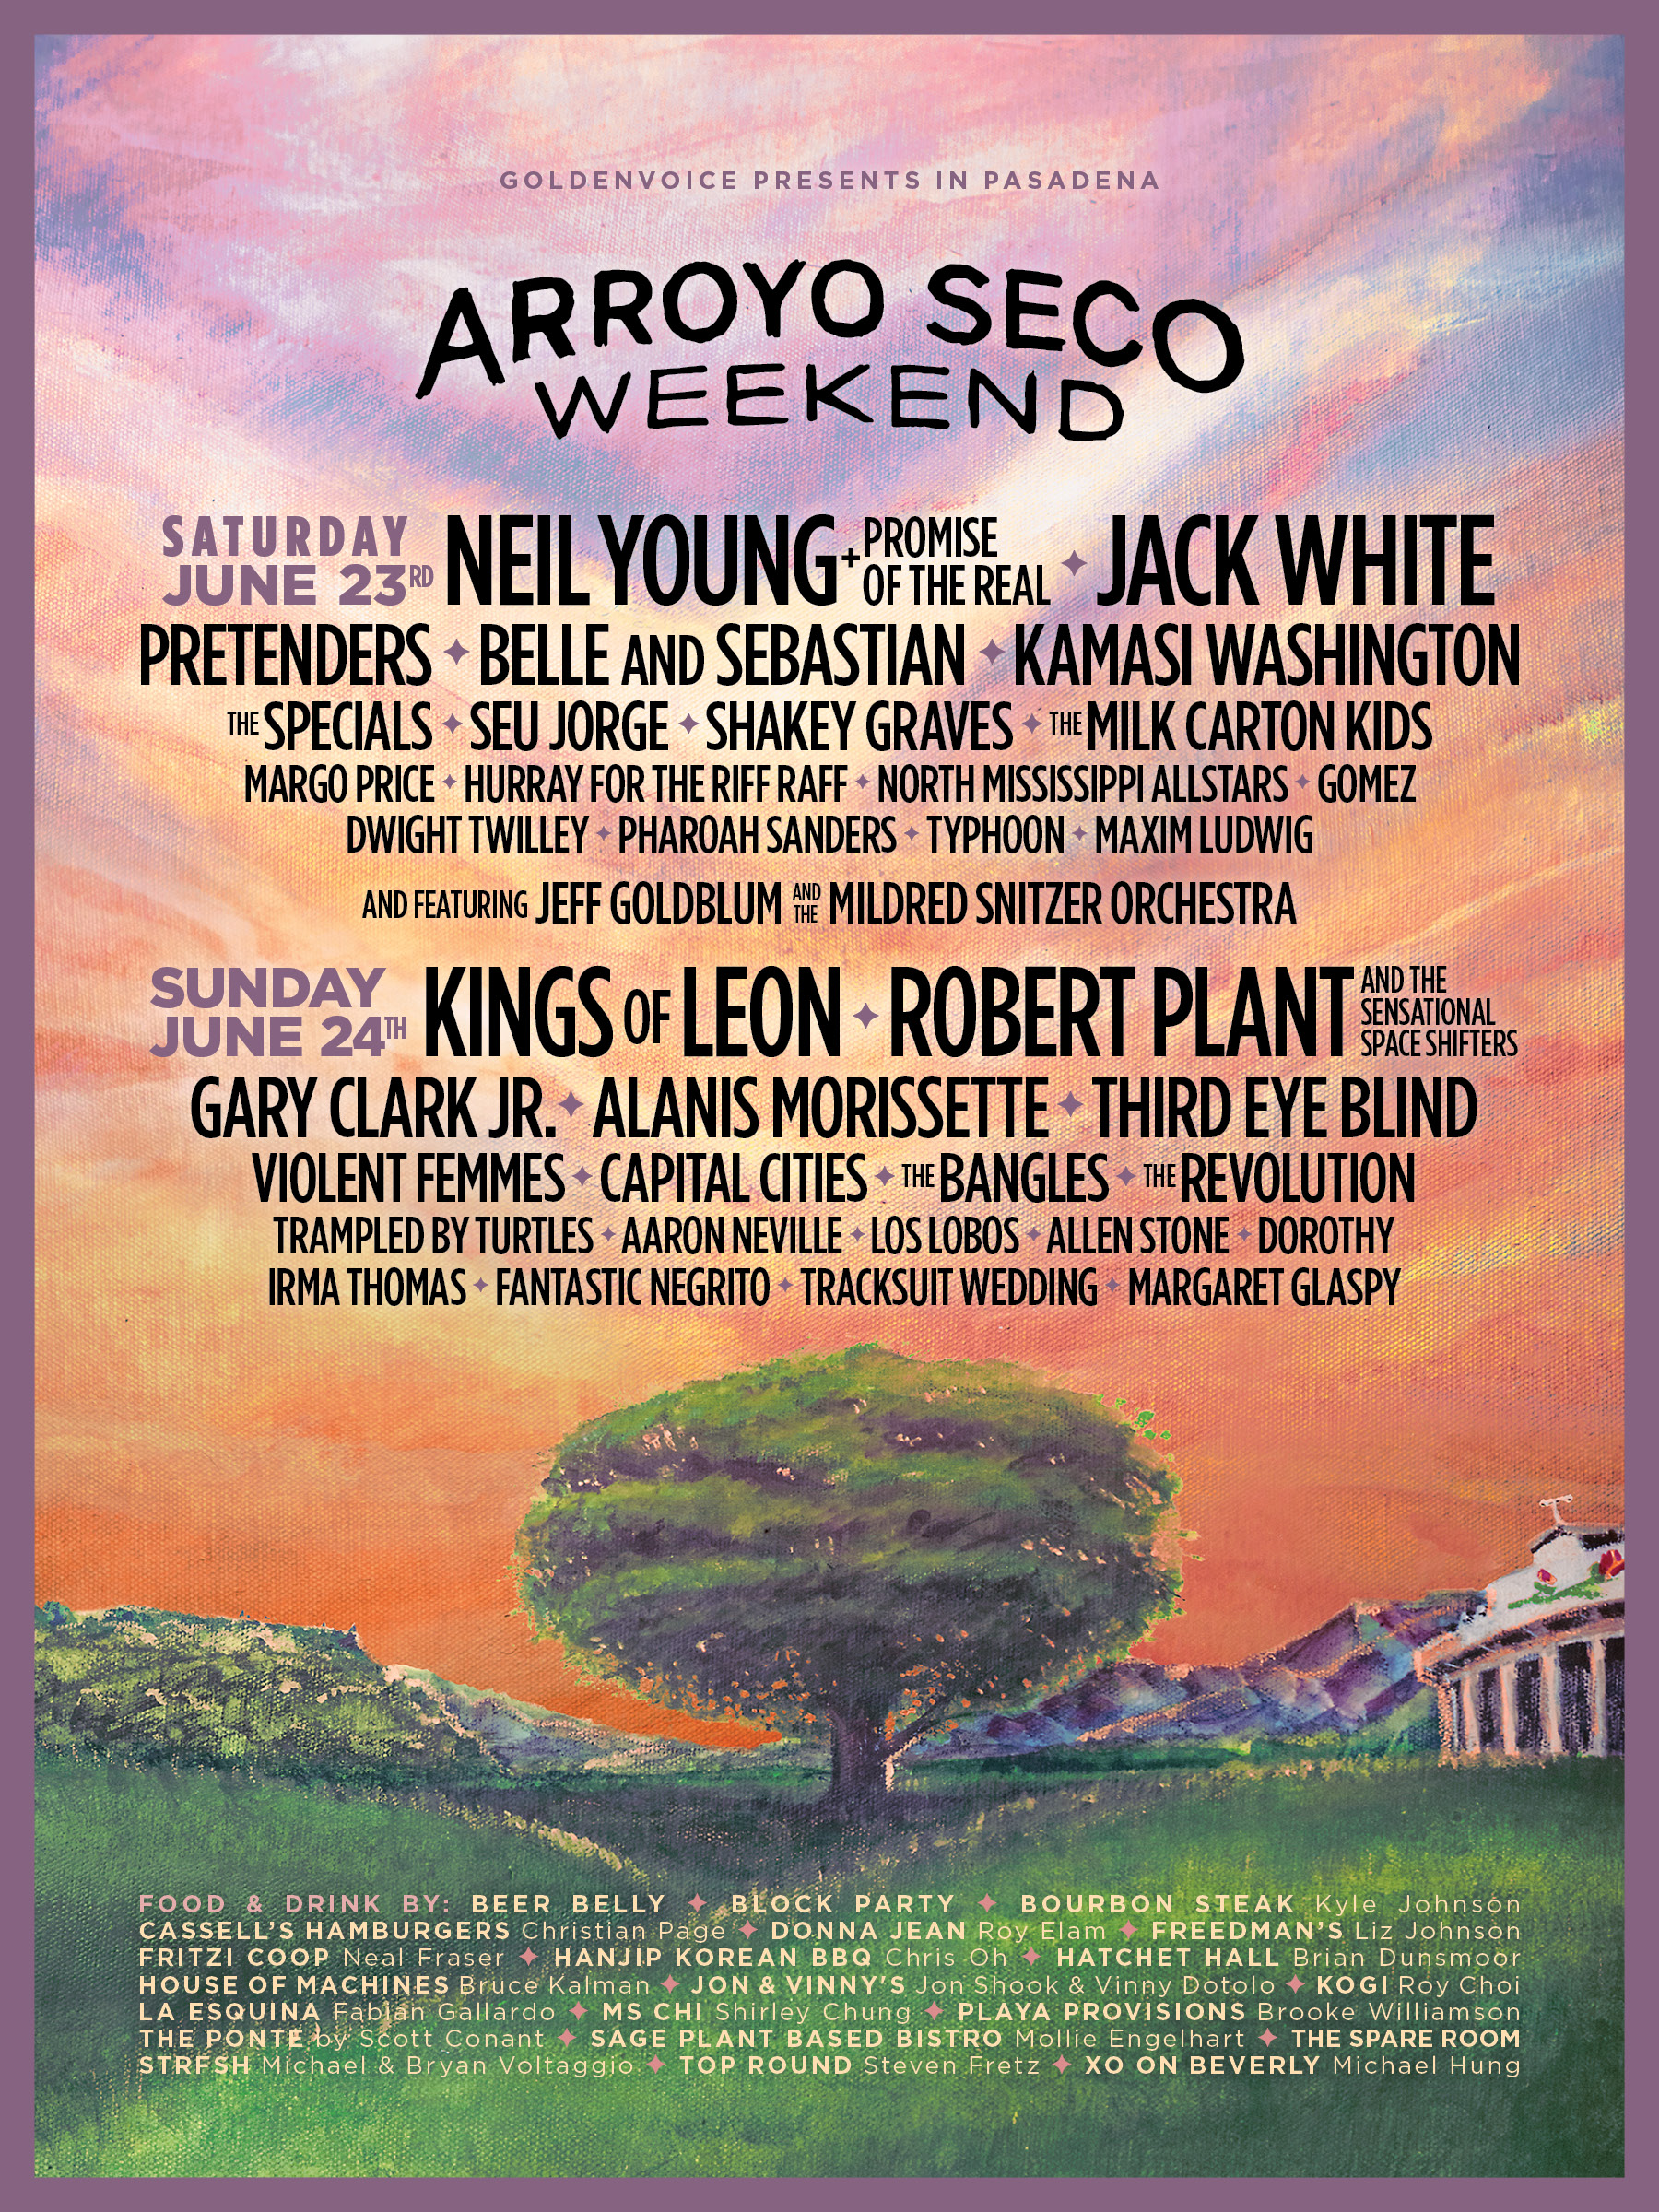 Arroyo Seco Weekend 2018 Poster